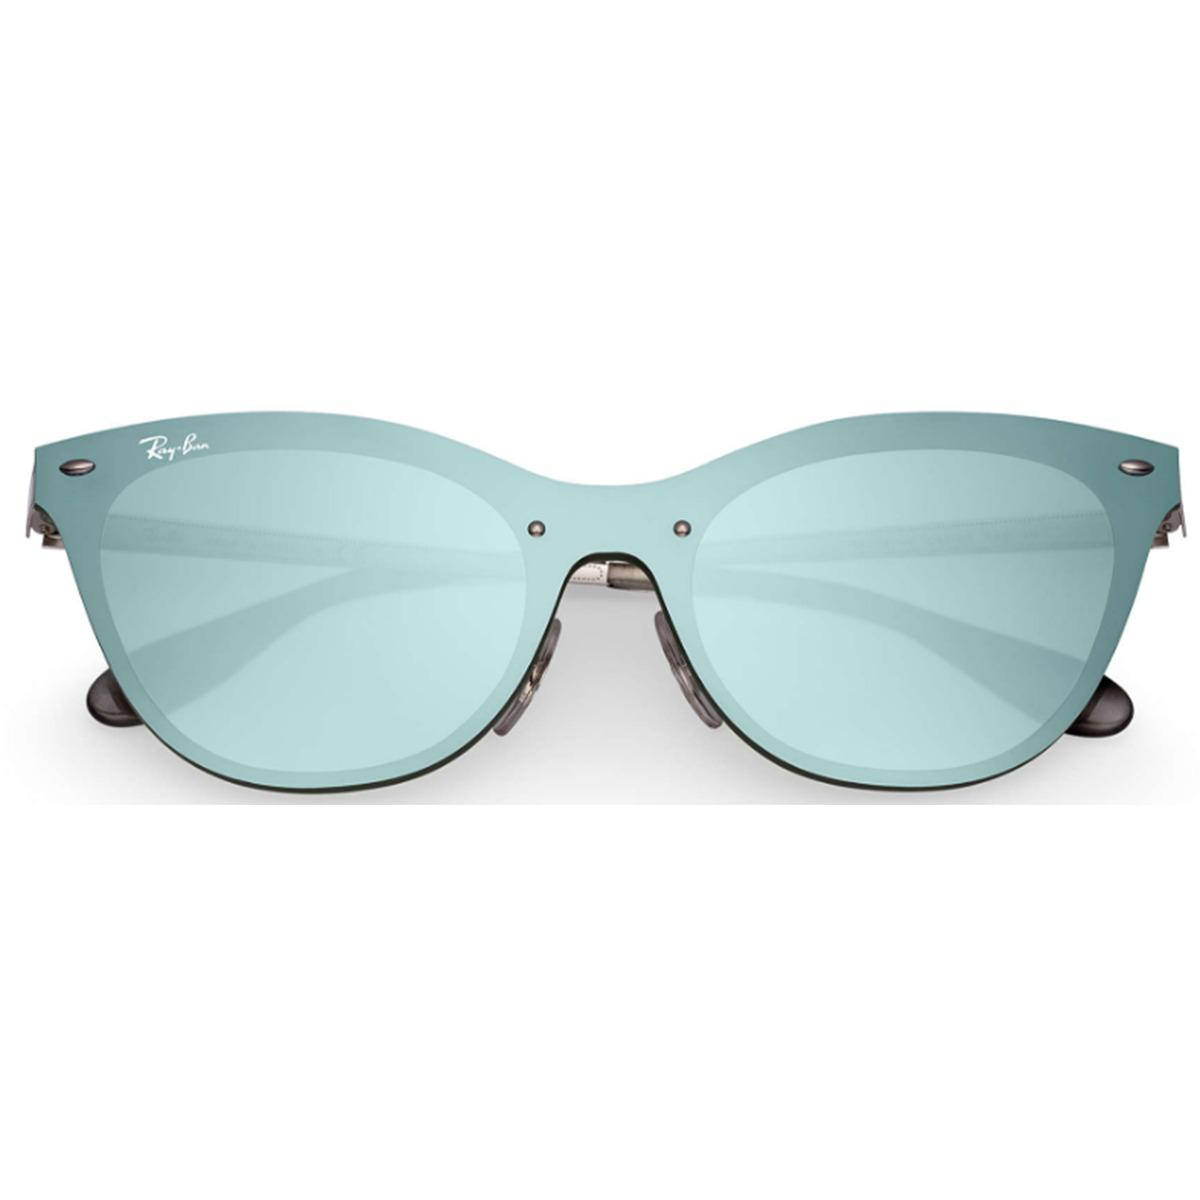 9a6874b7a3bd7 óculos de sol ray ban blaze cat eye rb3580 042 30. Carregando zoom... óculos  sol ray ban. Carregando zoom.